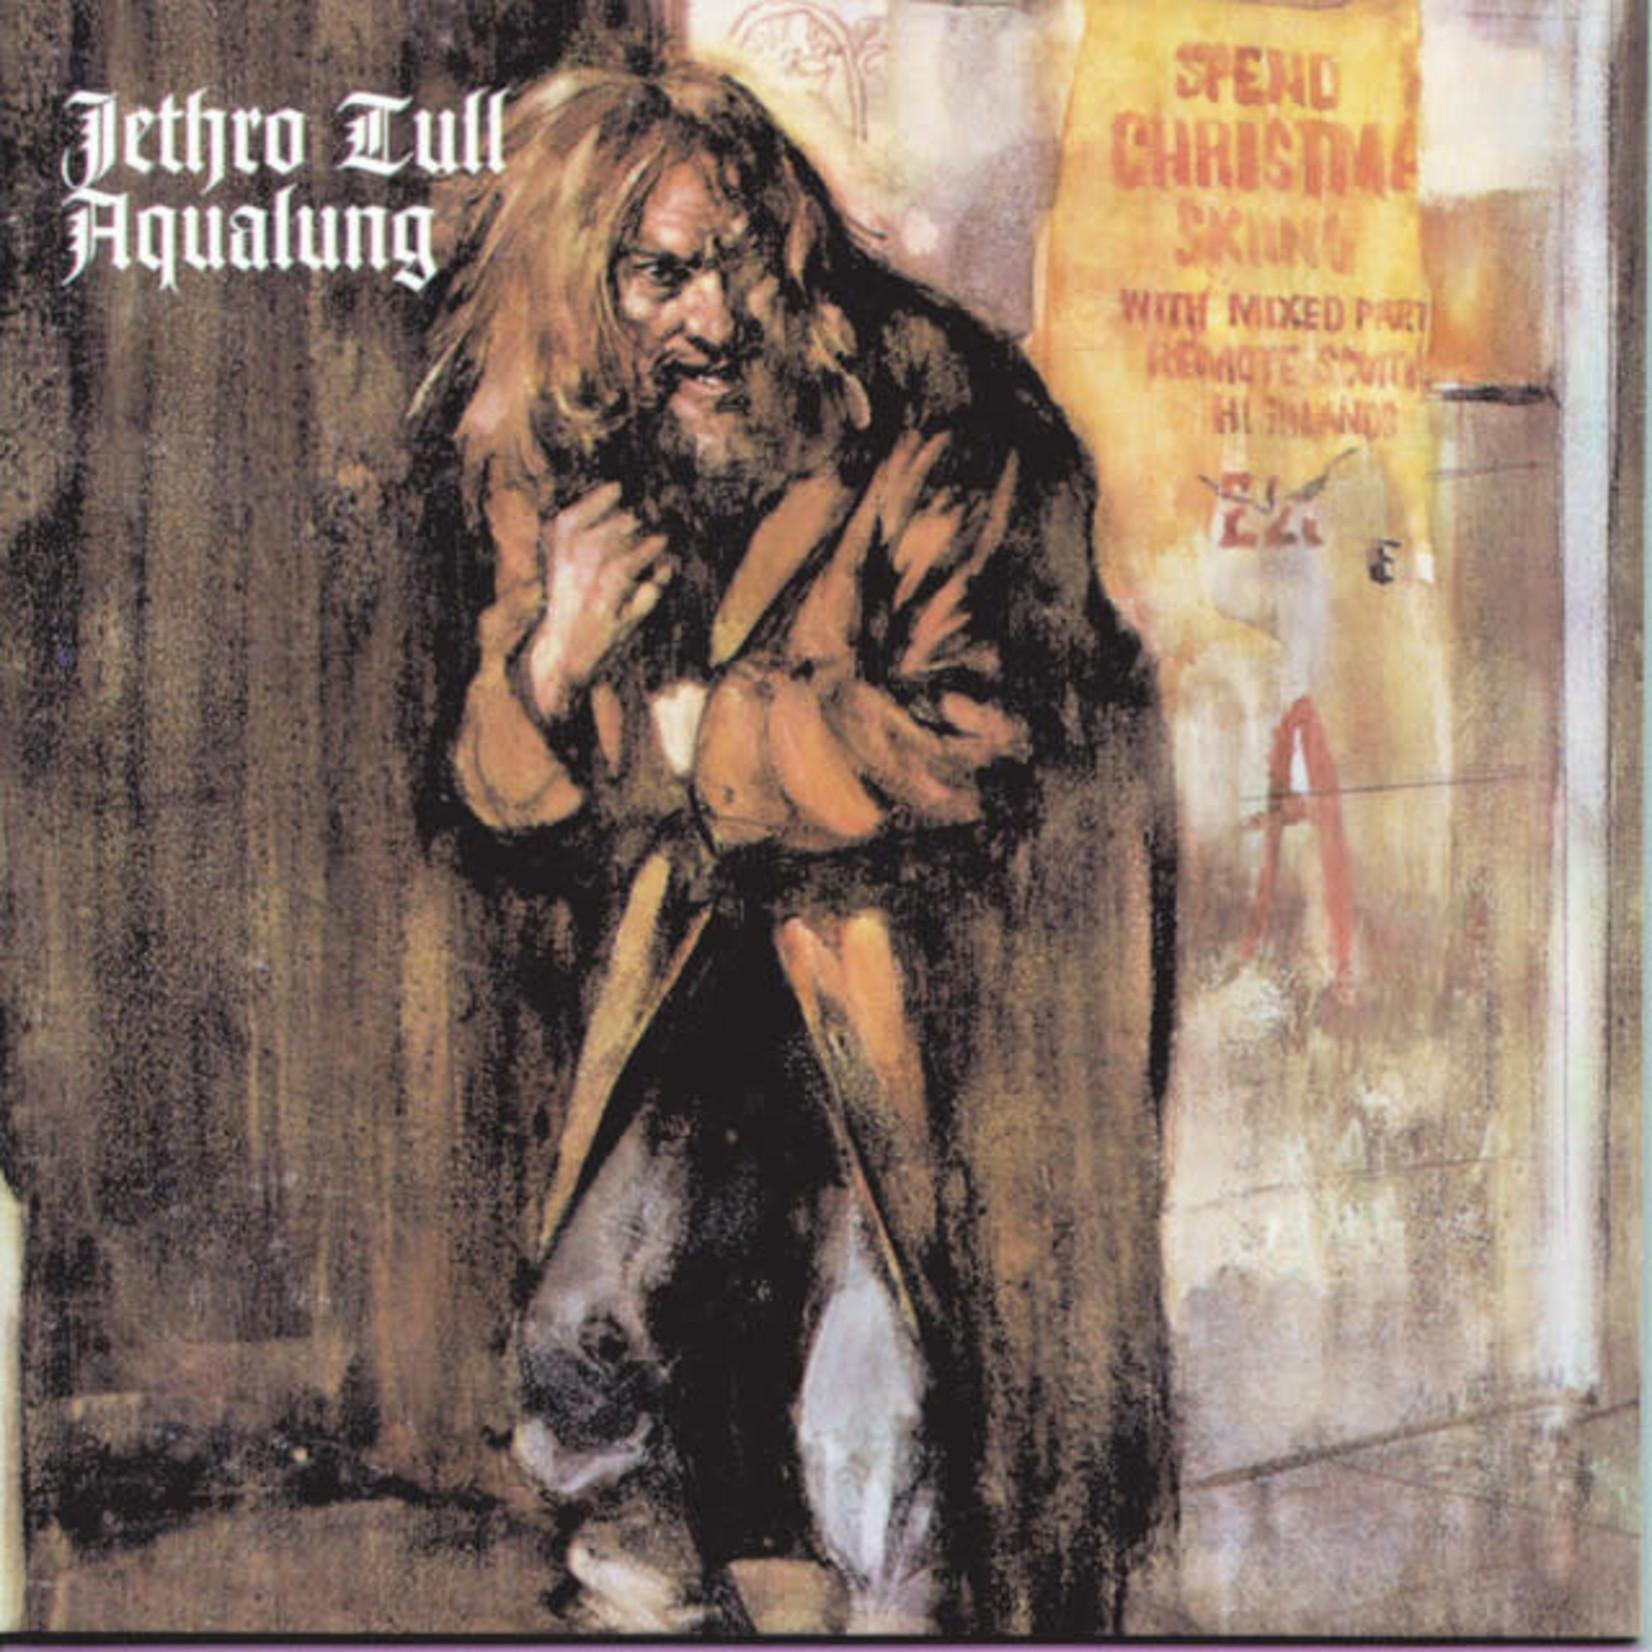 Vinyl Jethro Tull - Aqualung